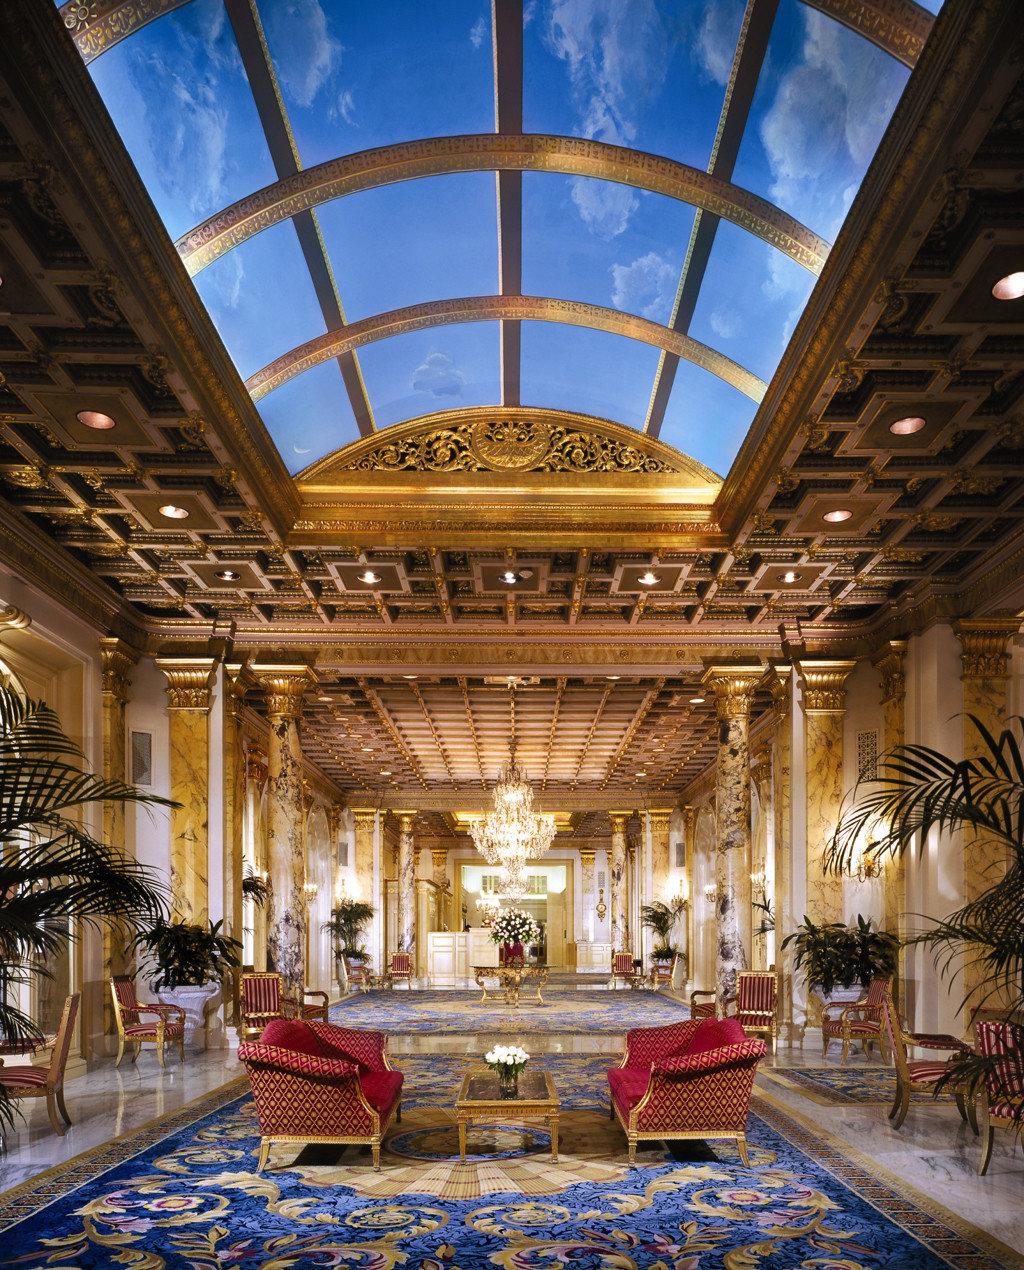 Elegant Hotels Lobby Lounge Luxury Resort Trip Ideas building palace ballroom place of worship hall